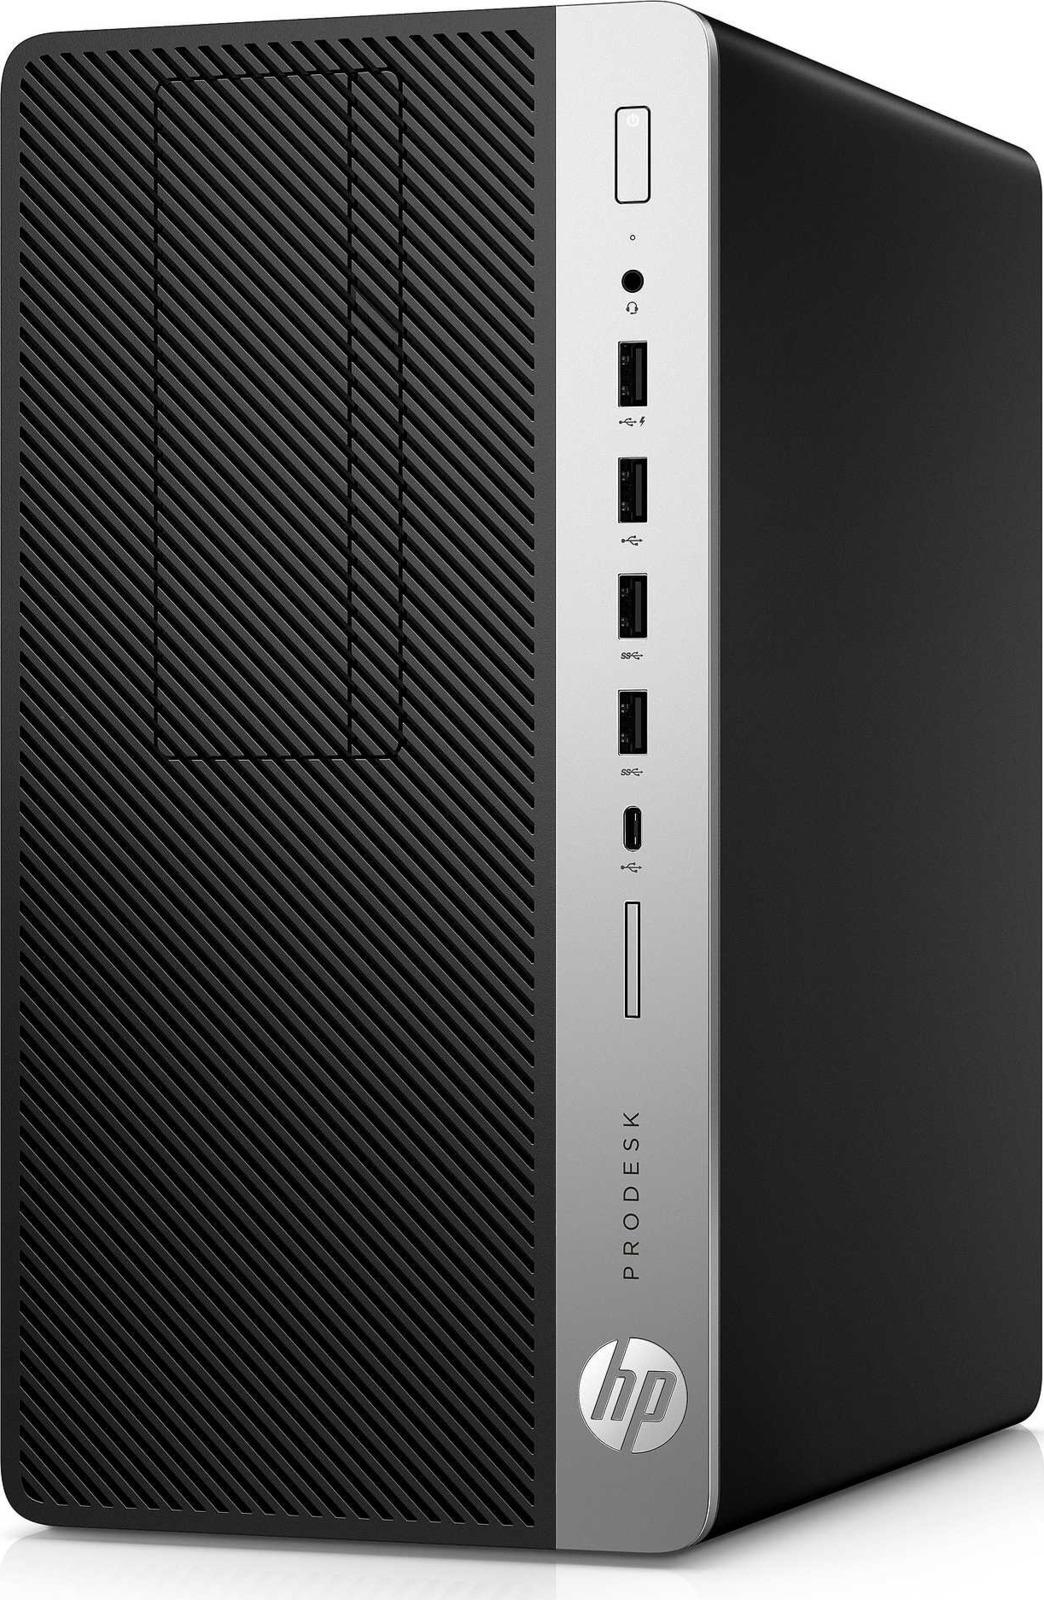 Системный блок HP ProDesk 400 G5 МТ, 4CZ34EA, черный системный блок